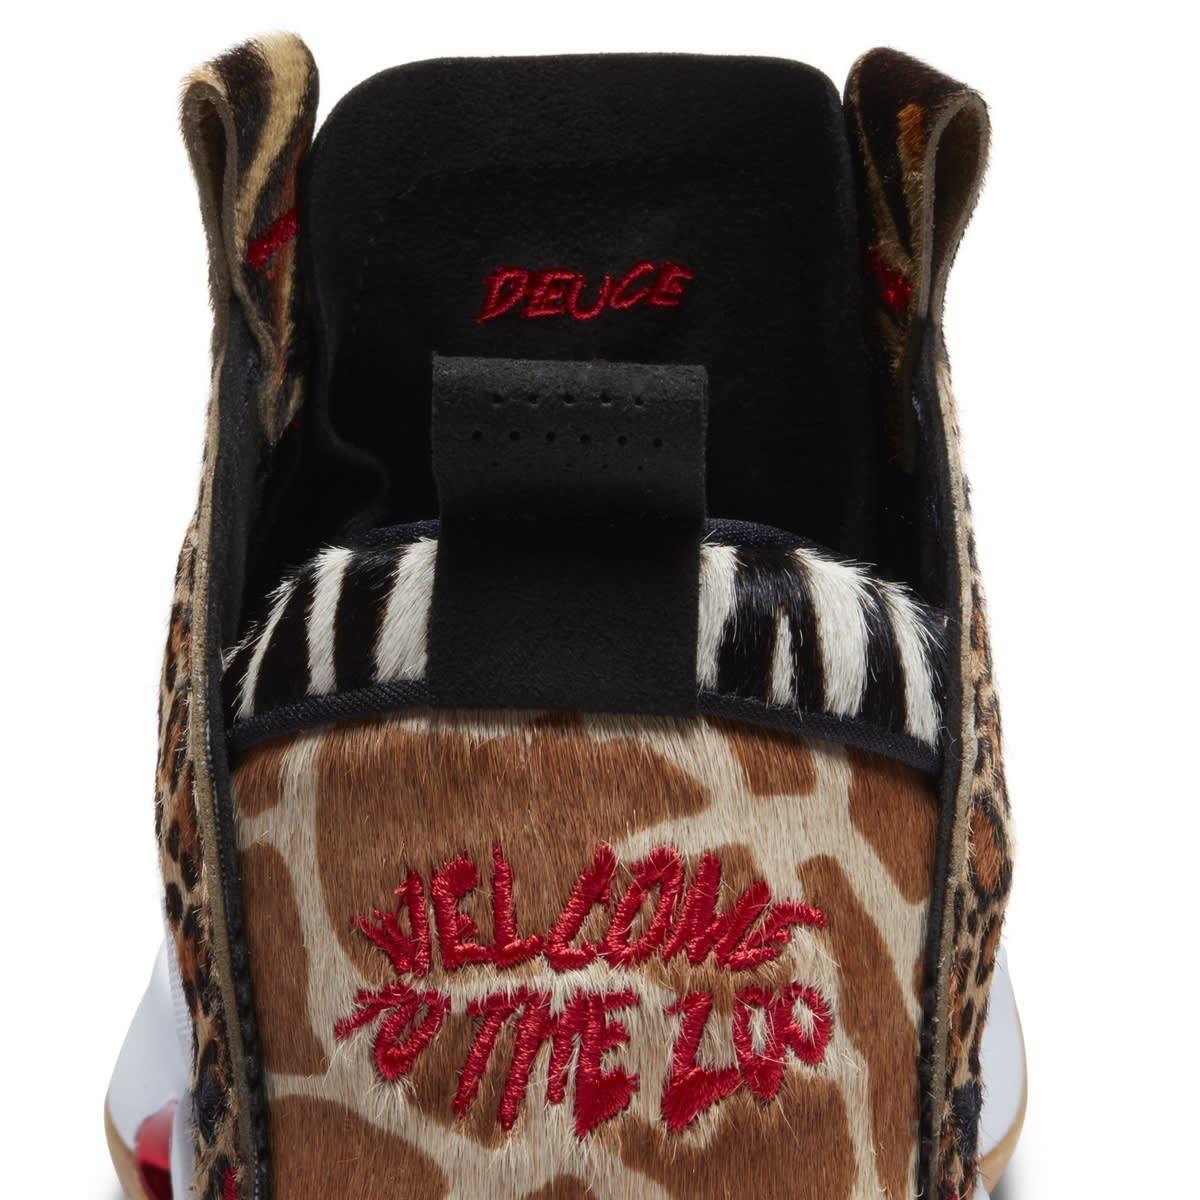 Air Jordan 34 PE Jayson Tatum 'Welcome to the Zoo' Heel